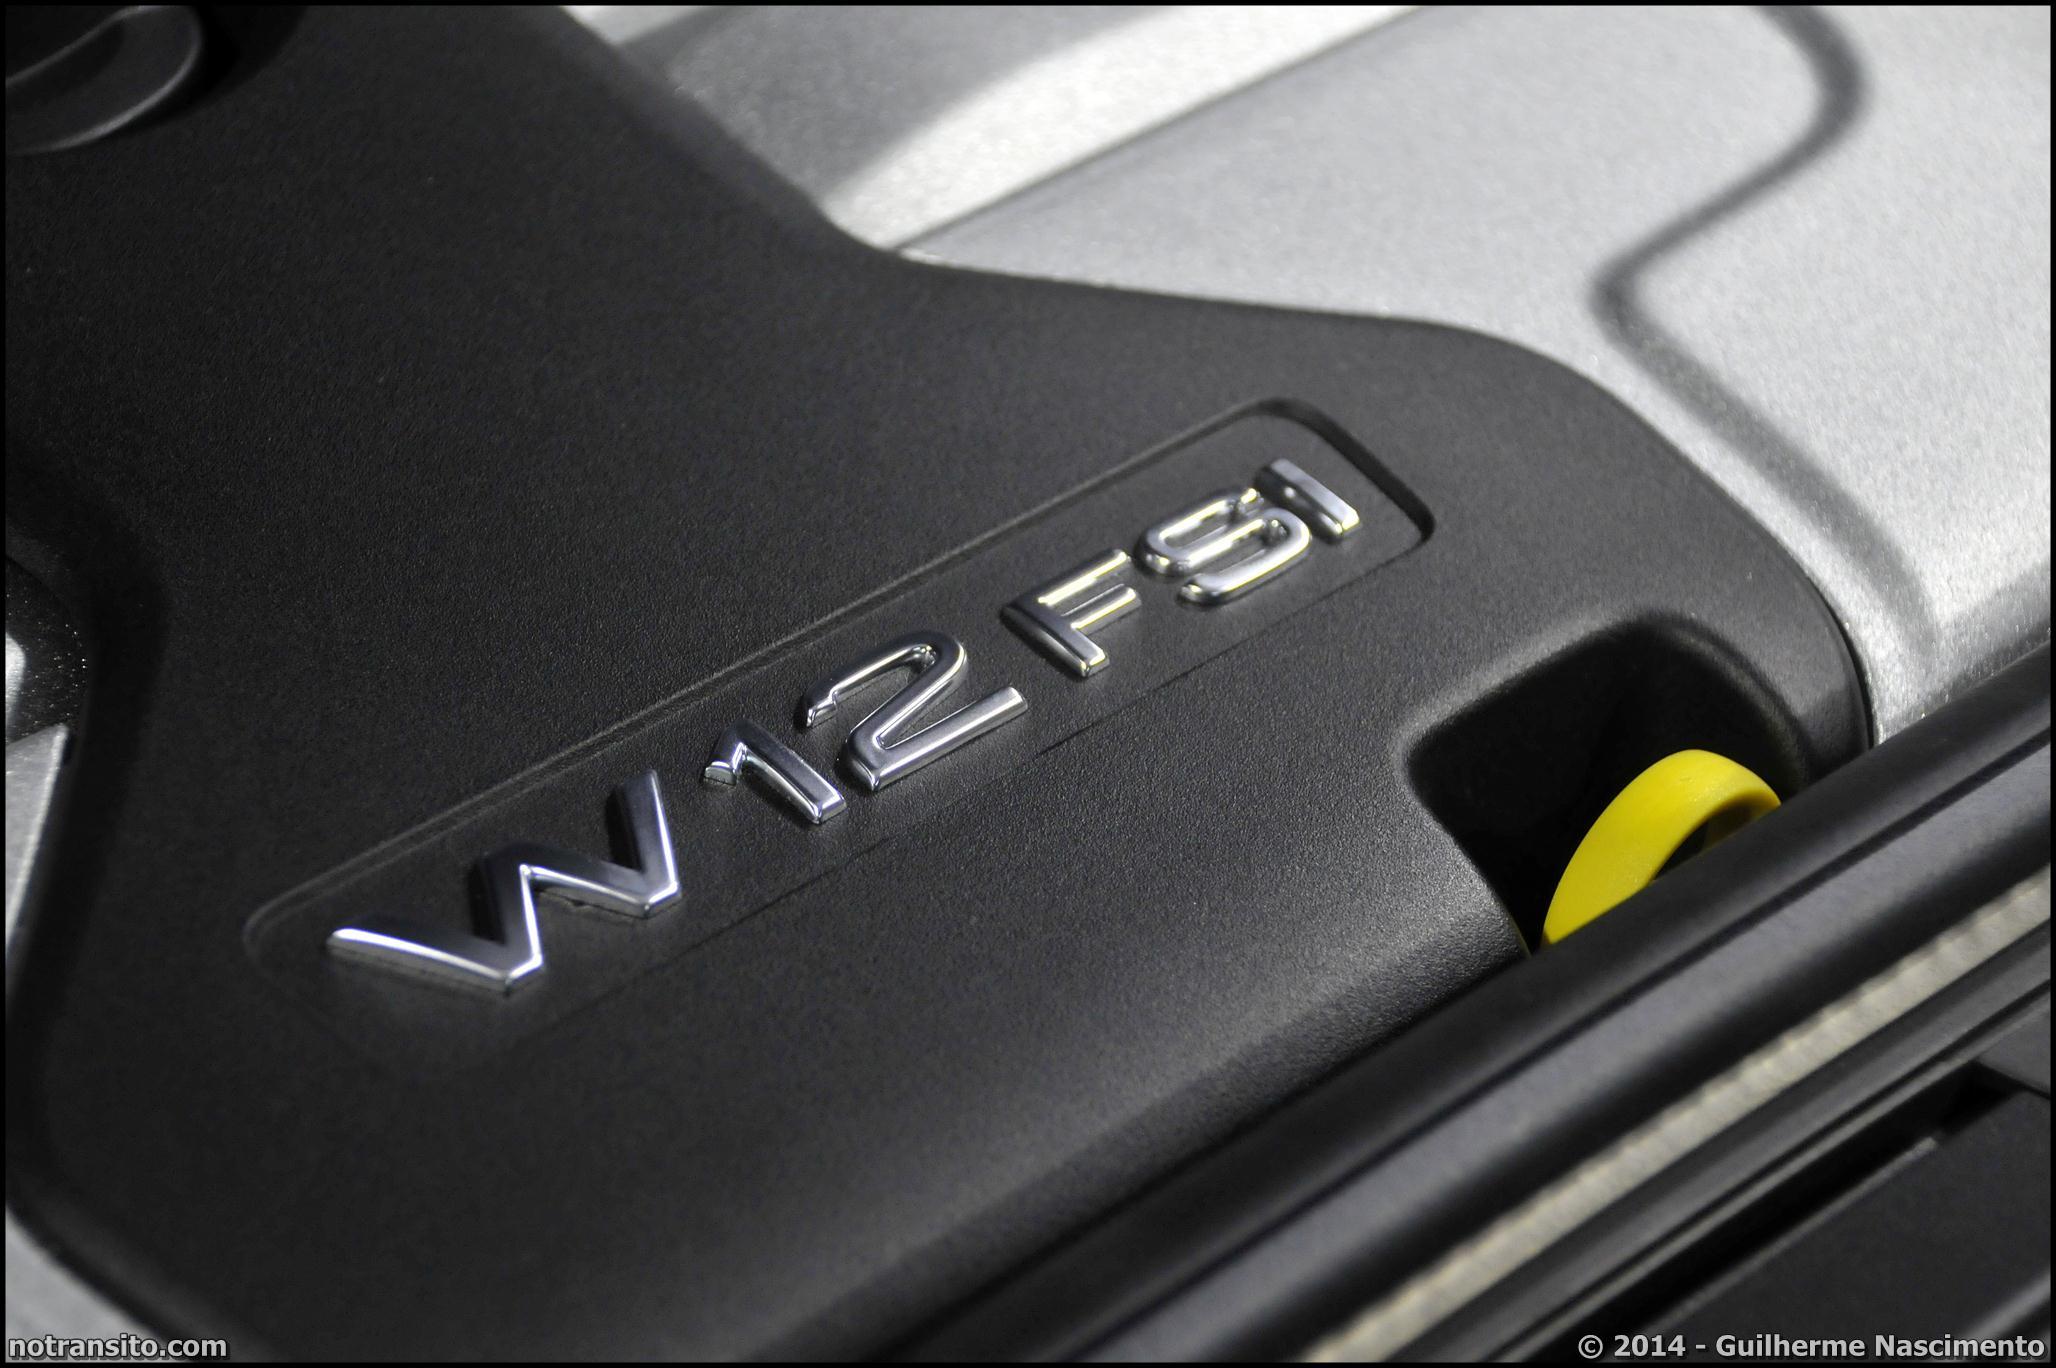 Audi A8 L W12 Exclusive Concept, W12 FSI engine, Salão do Automóvel 2014